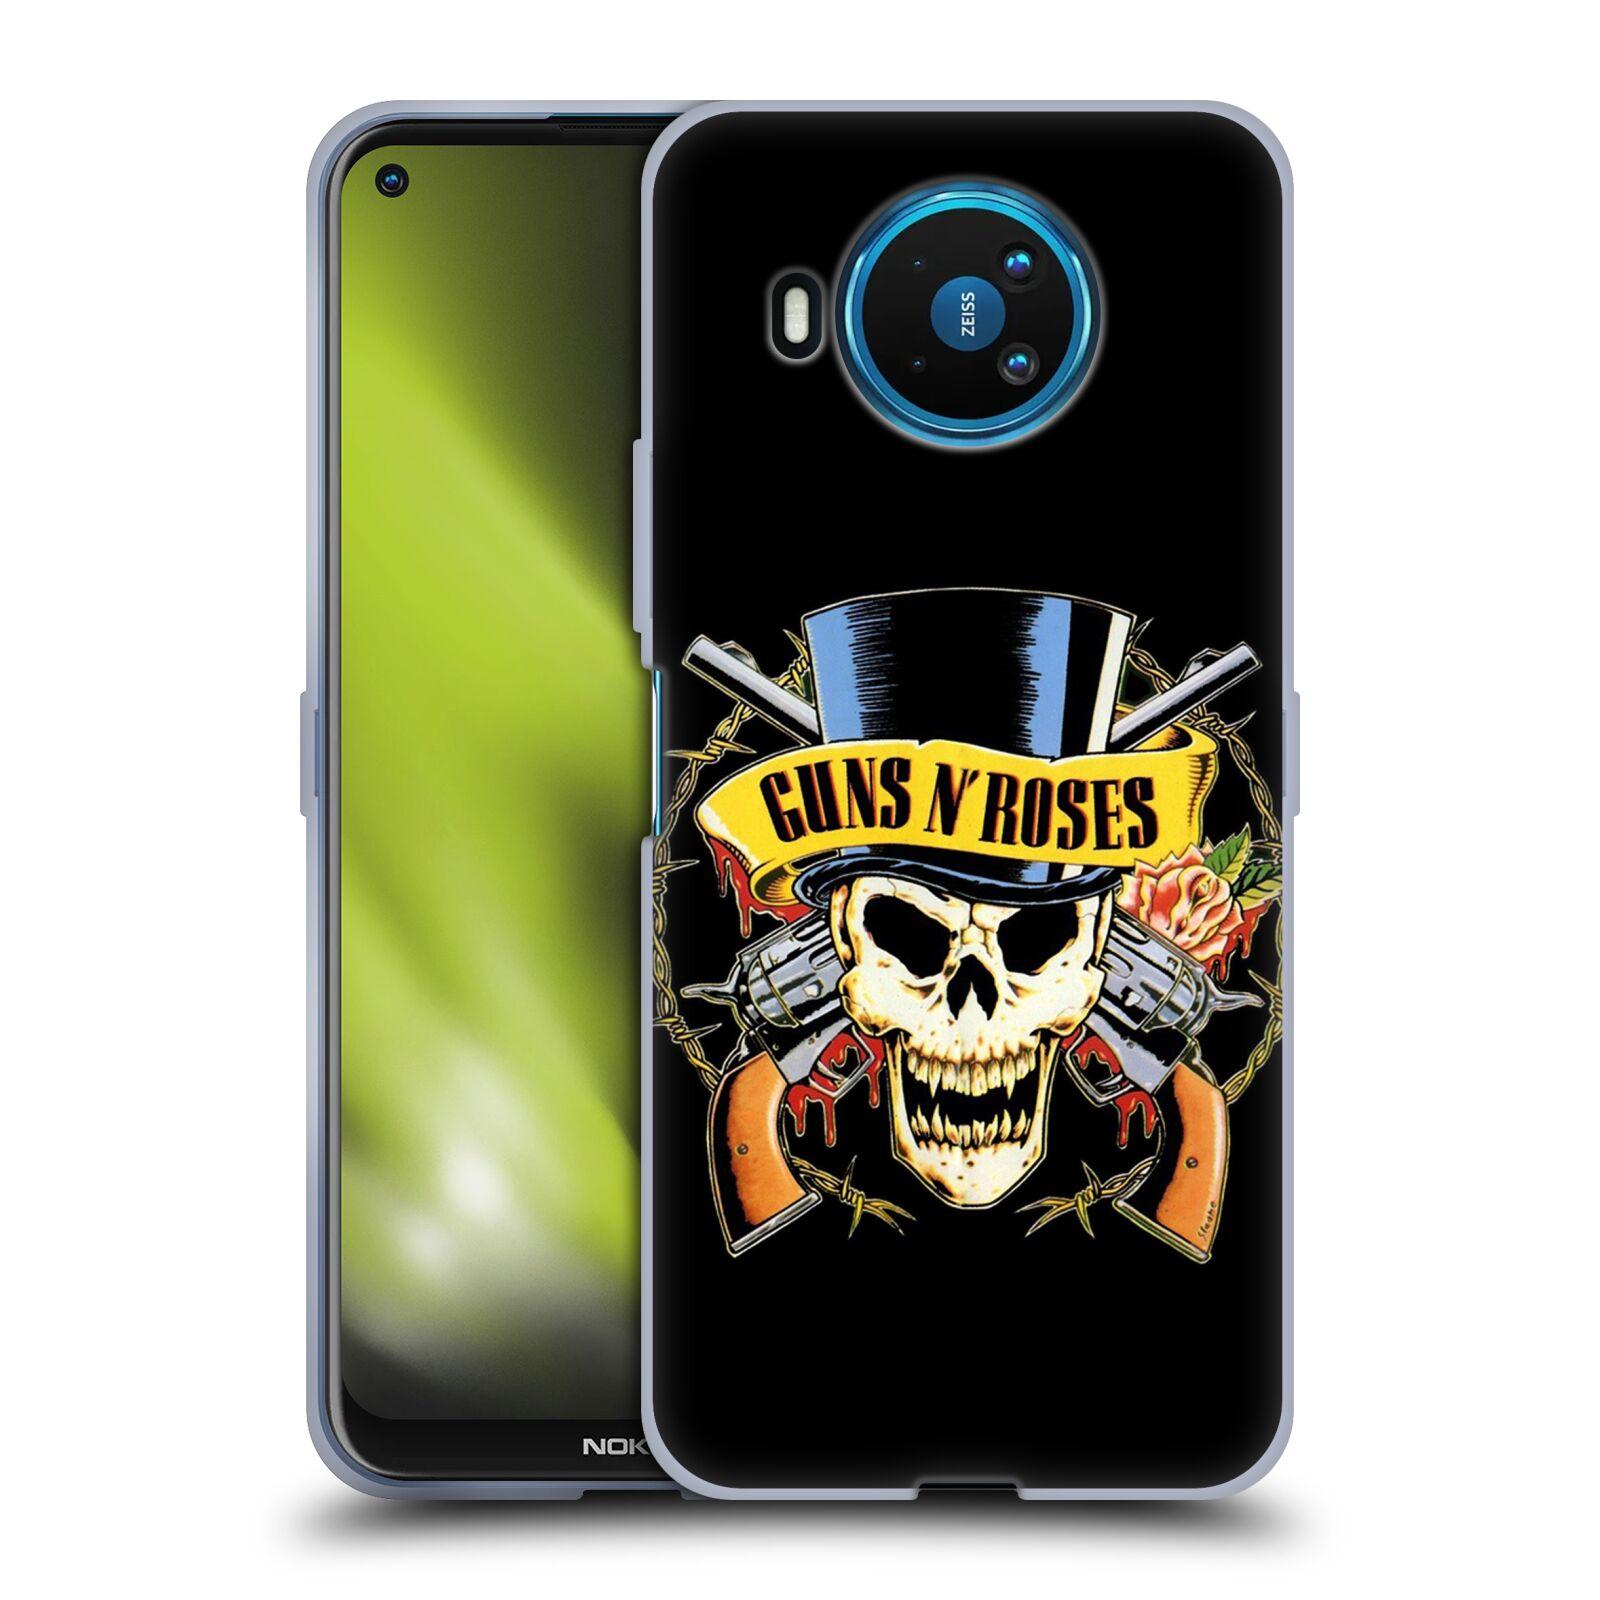 Silikonové pouzdro na mobil Nokia 8.3 5G - Head Case - Guns N' Roses - Lebka